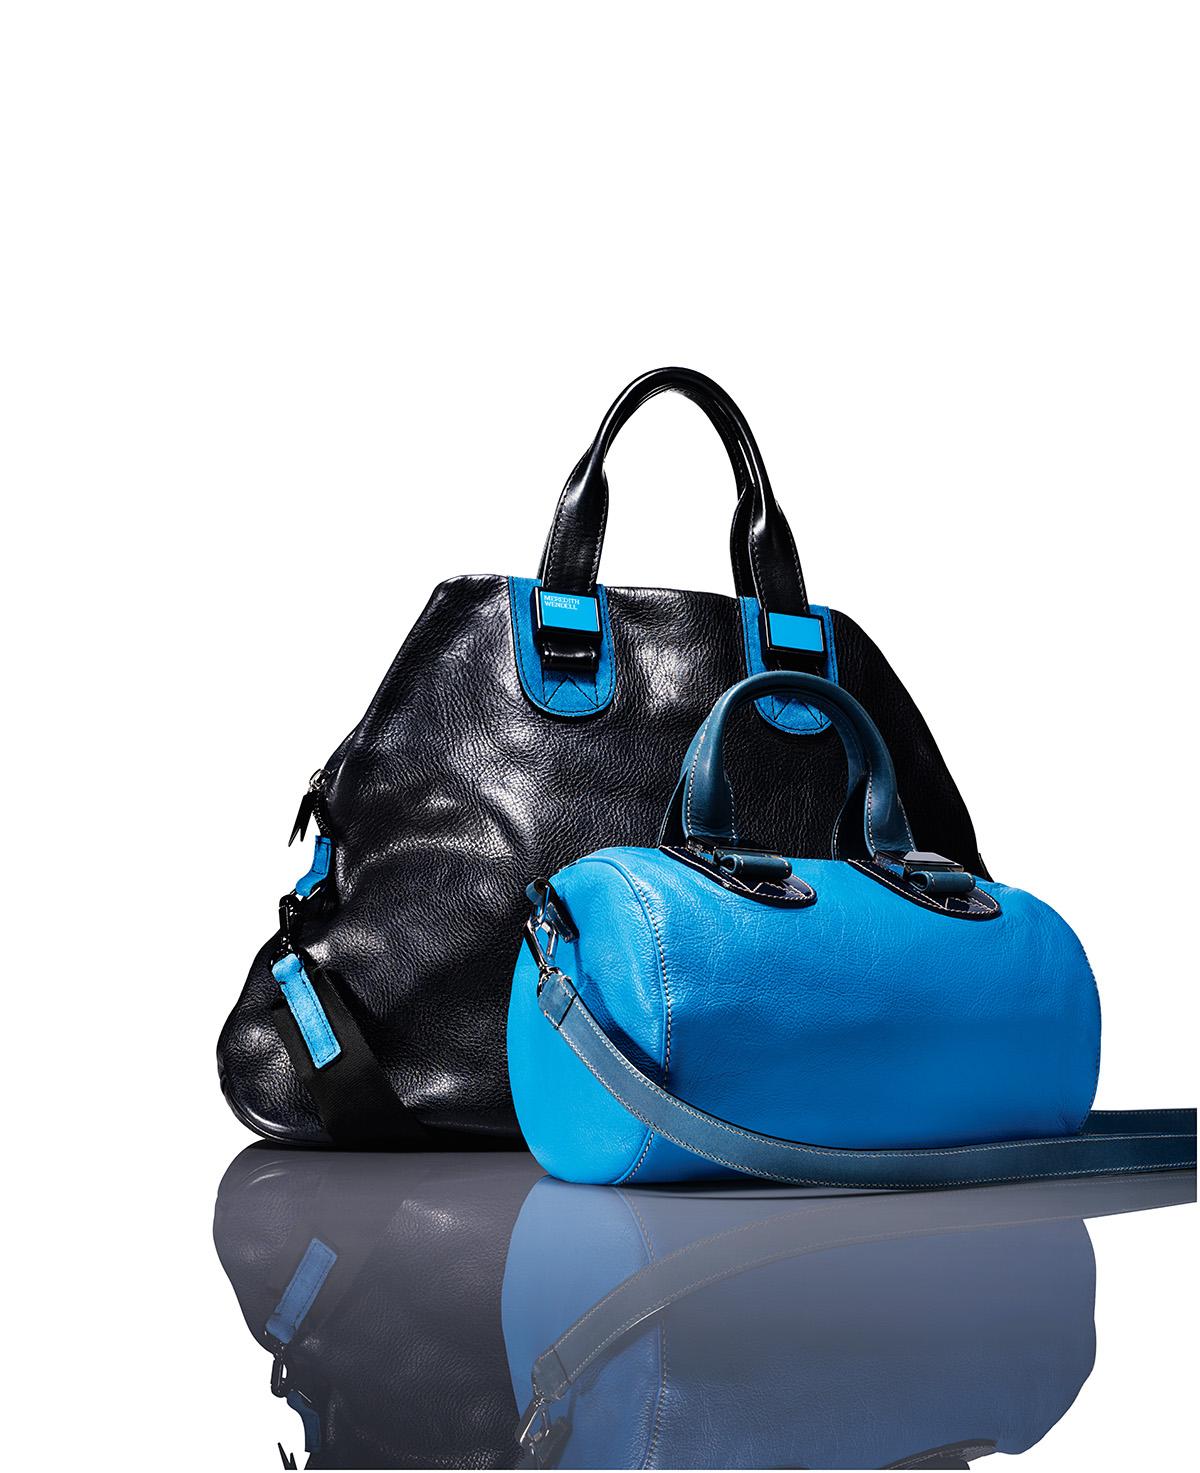 mmeredith wendell handbags